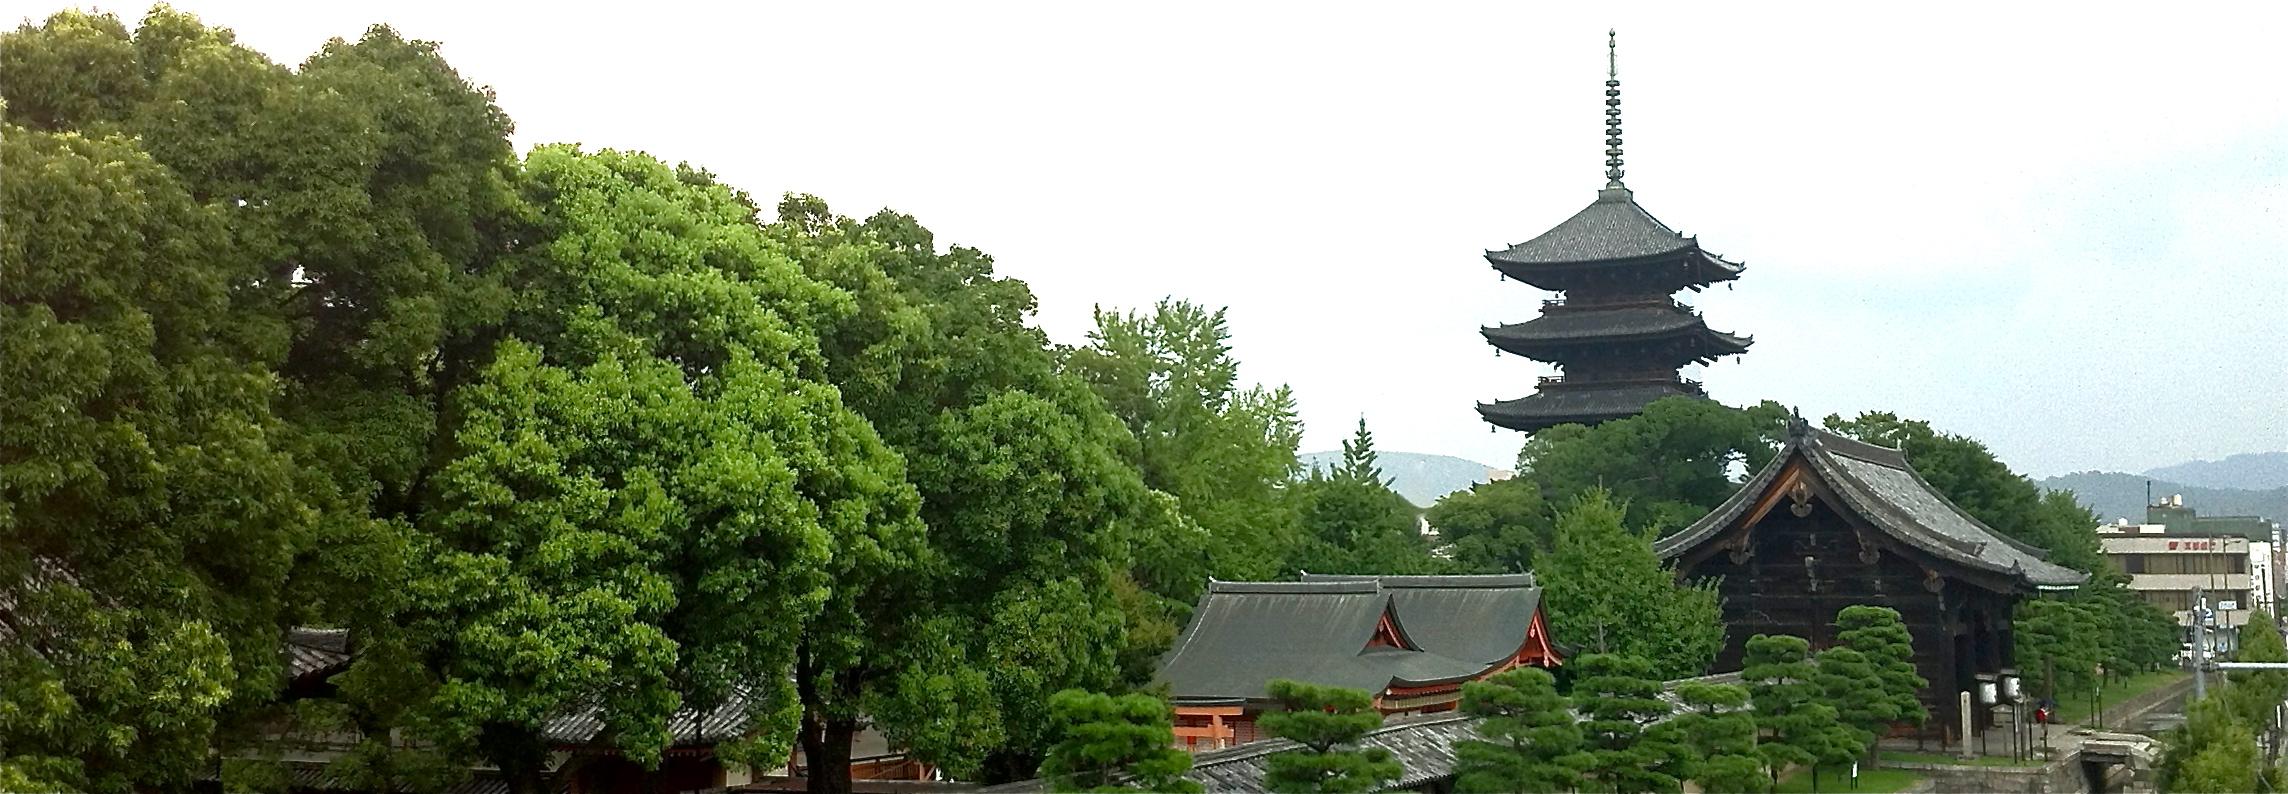 Toji Kyoto